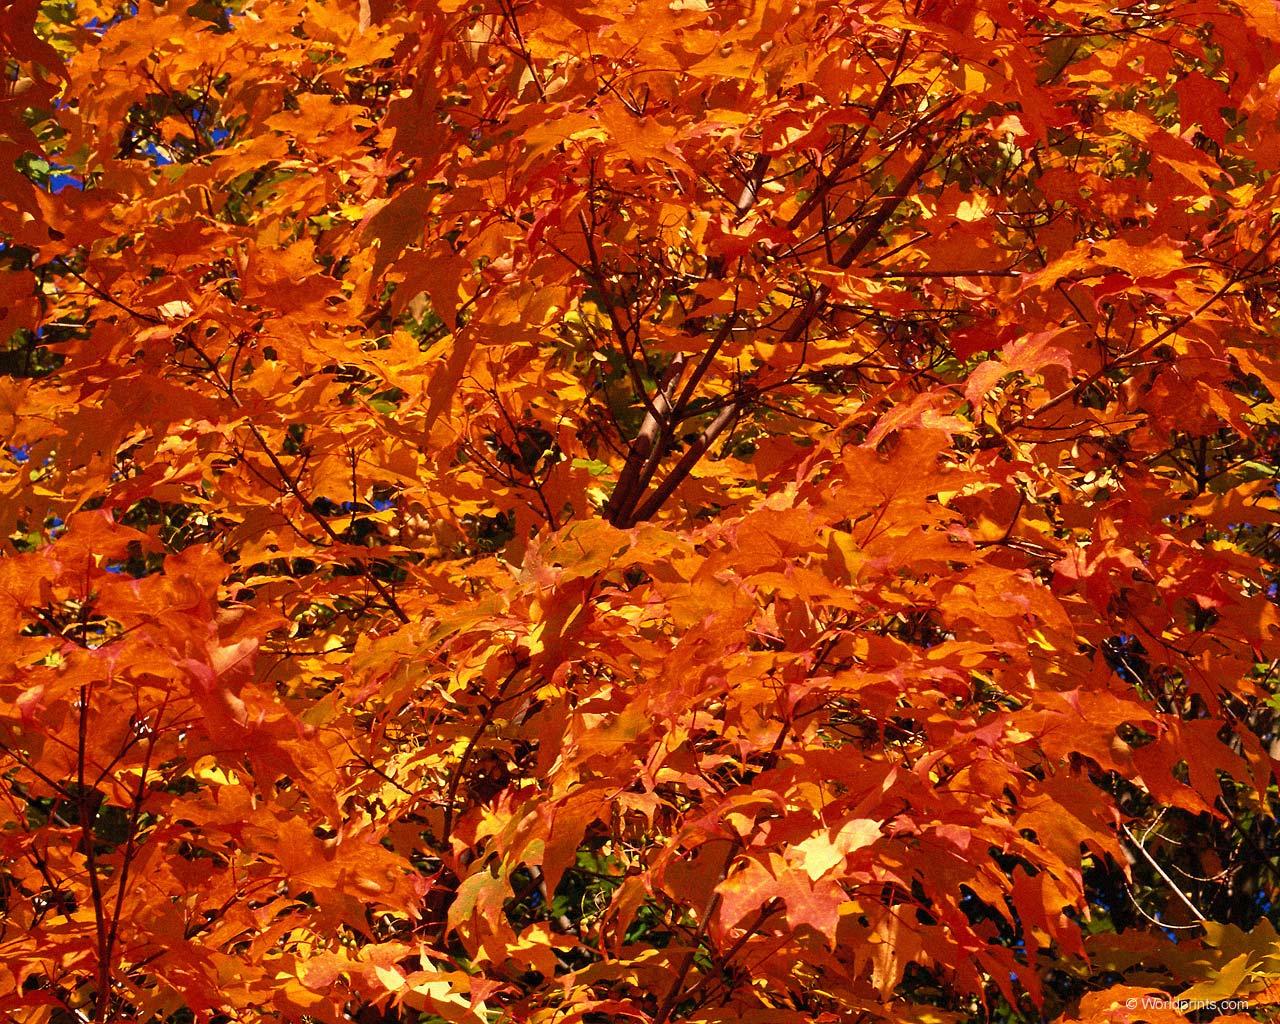 Orange Leaves 33489 1680x1050 px